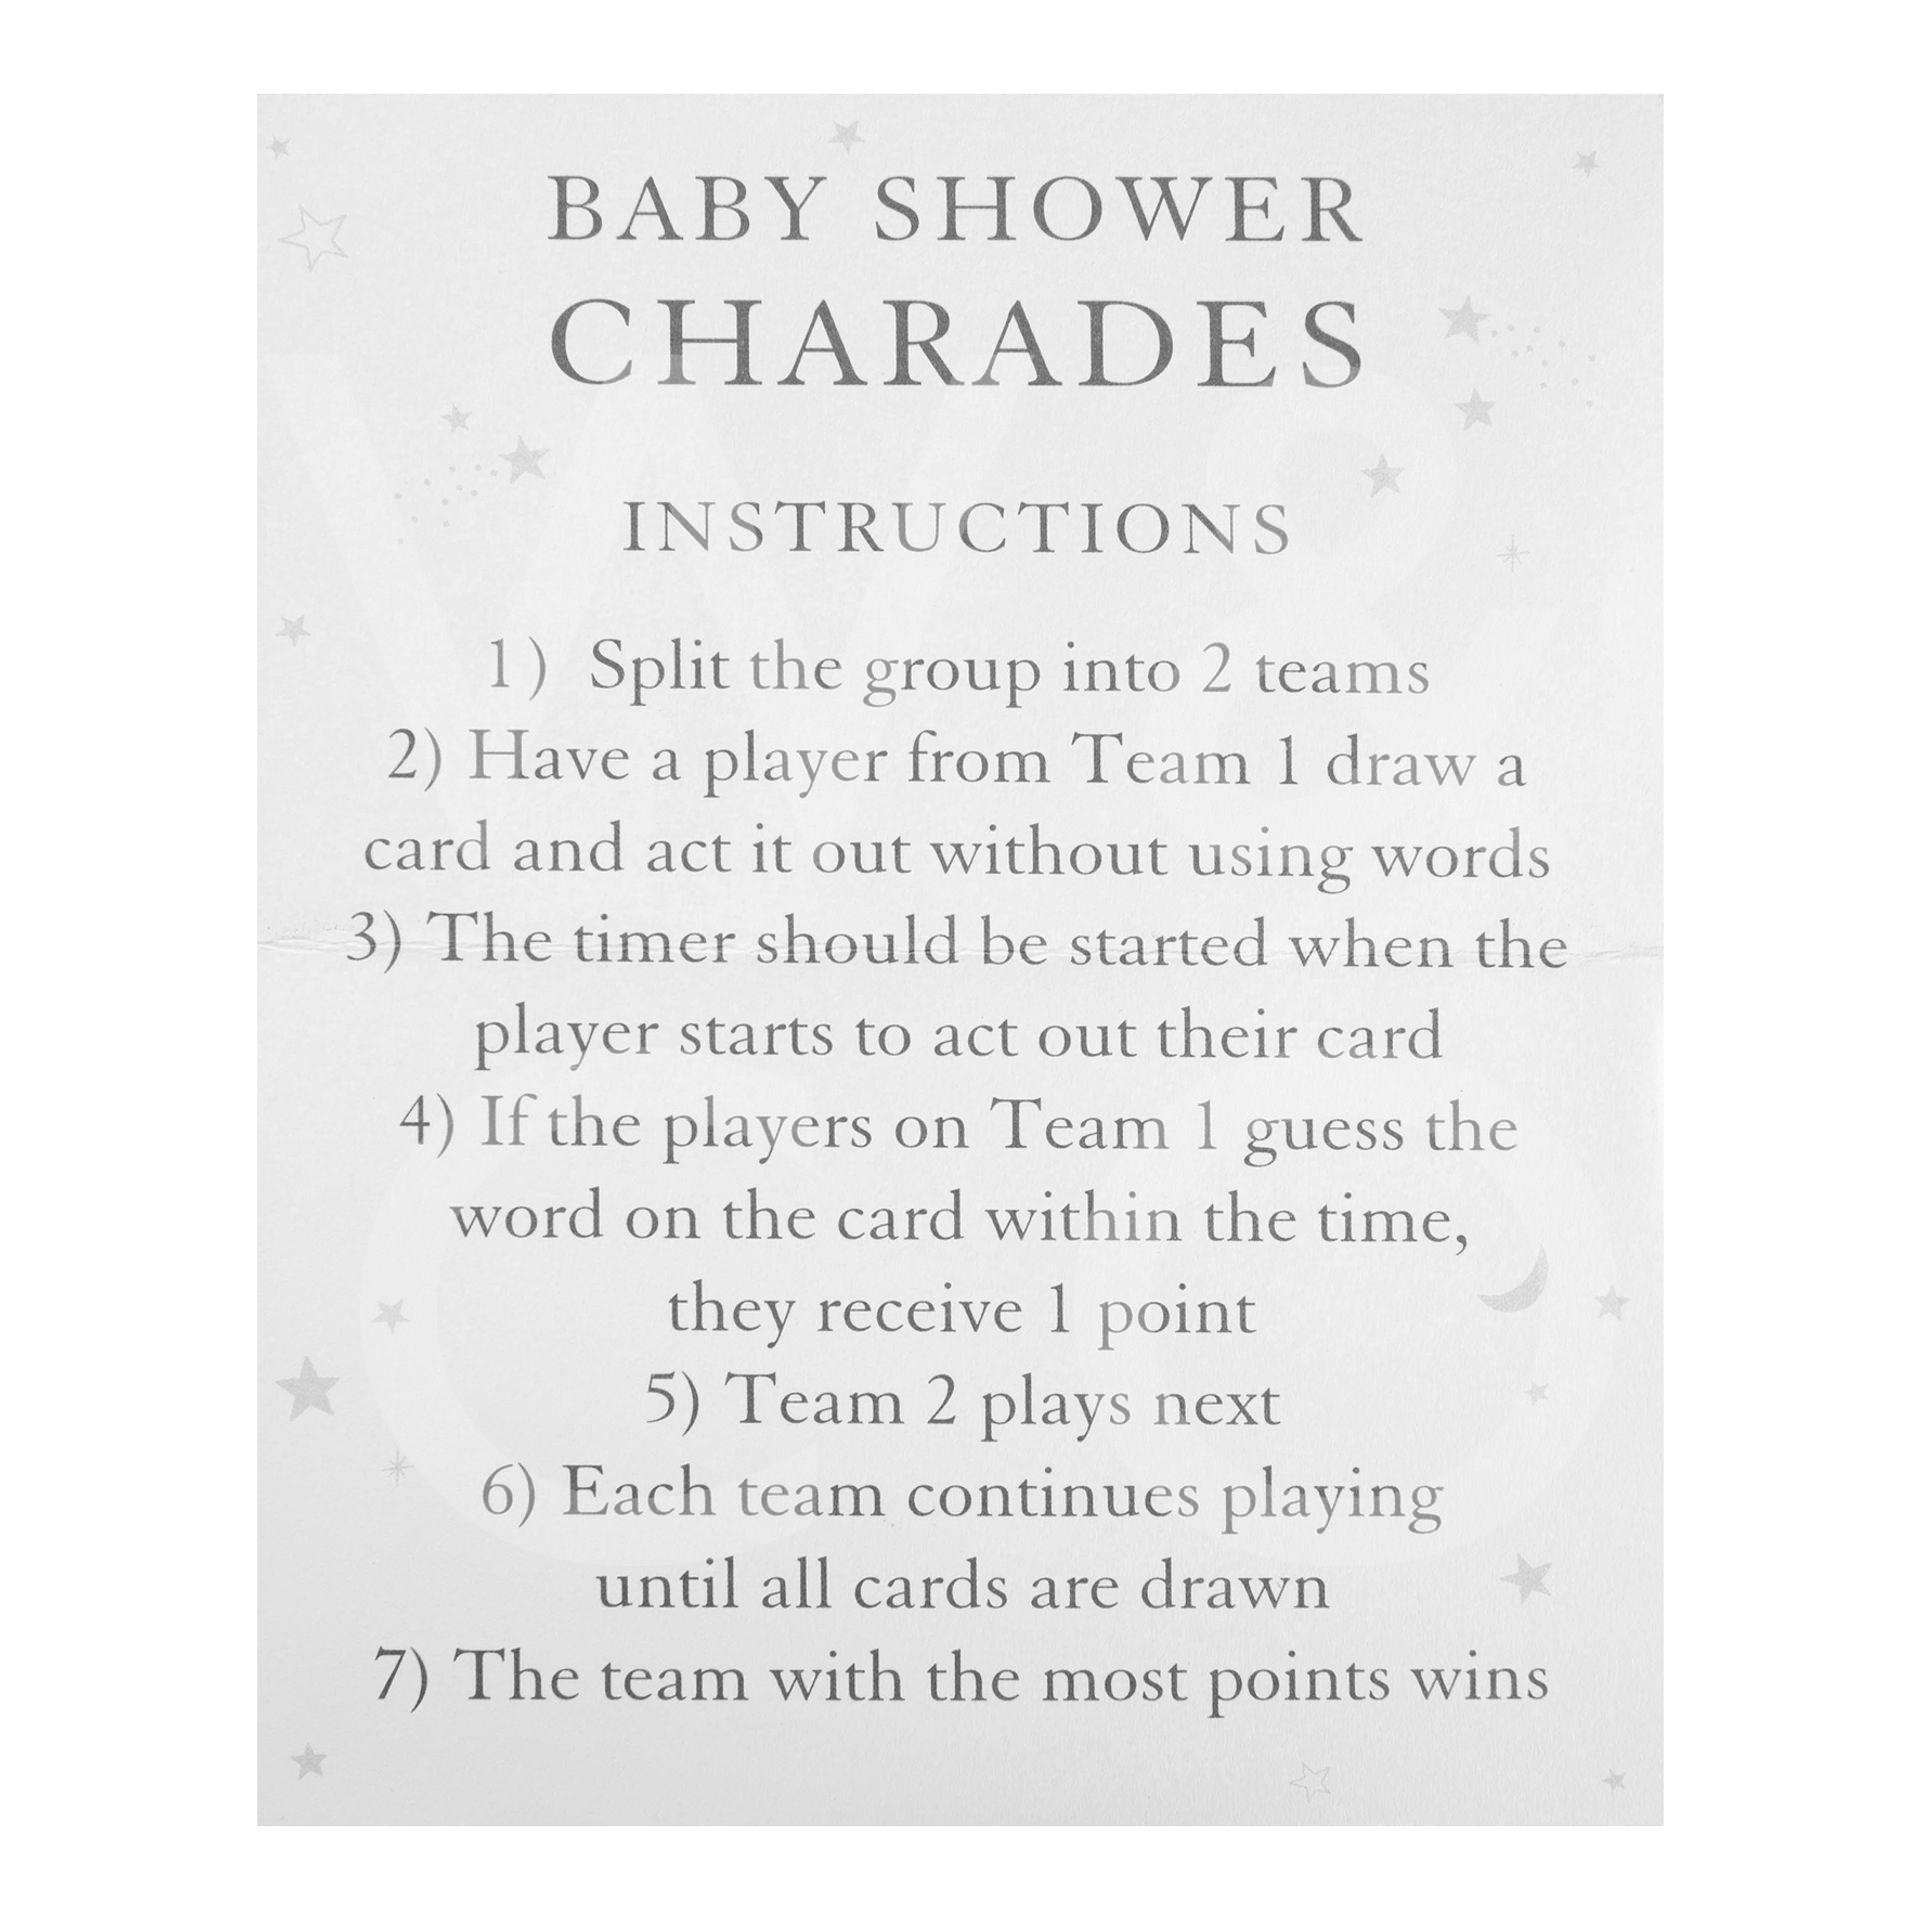 Bambino Baby Shower Game Charades